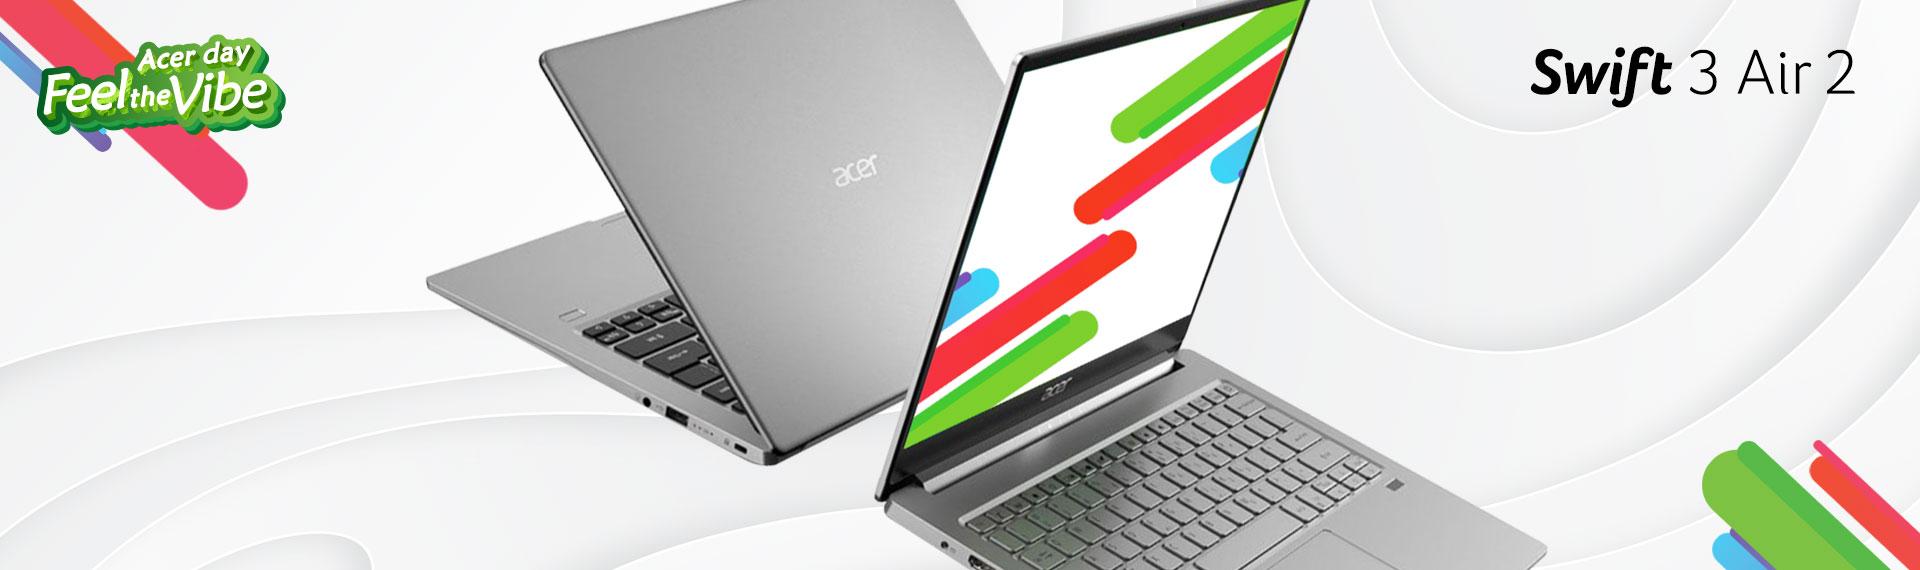 Swift 3 Air 2 (SF313-52), Laptop Premium QHD Pertama berlayar 3:2 untuk Visual Mengagumkan!